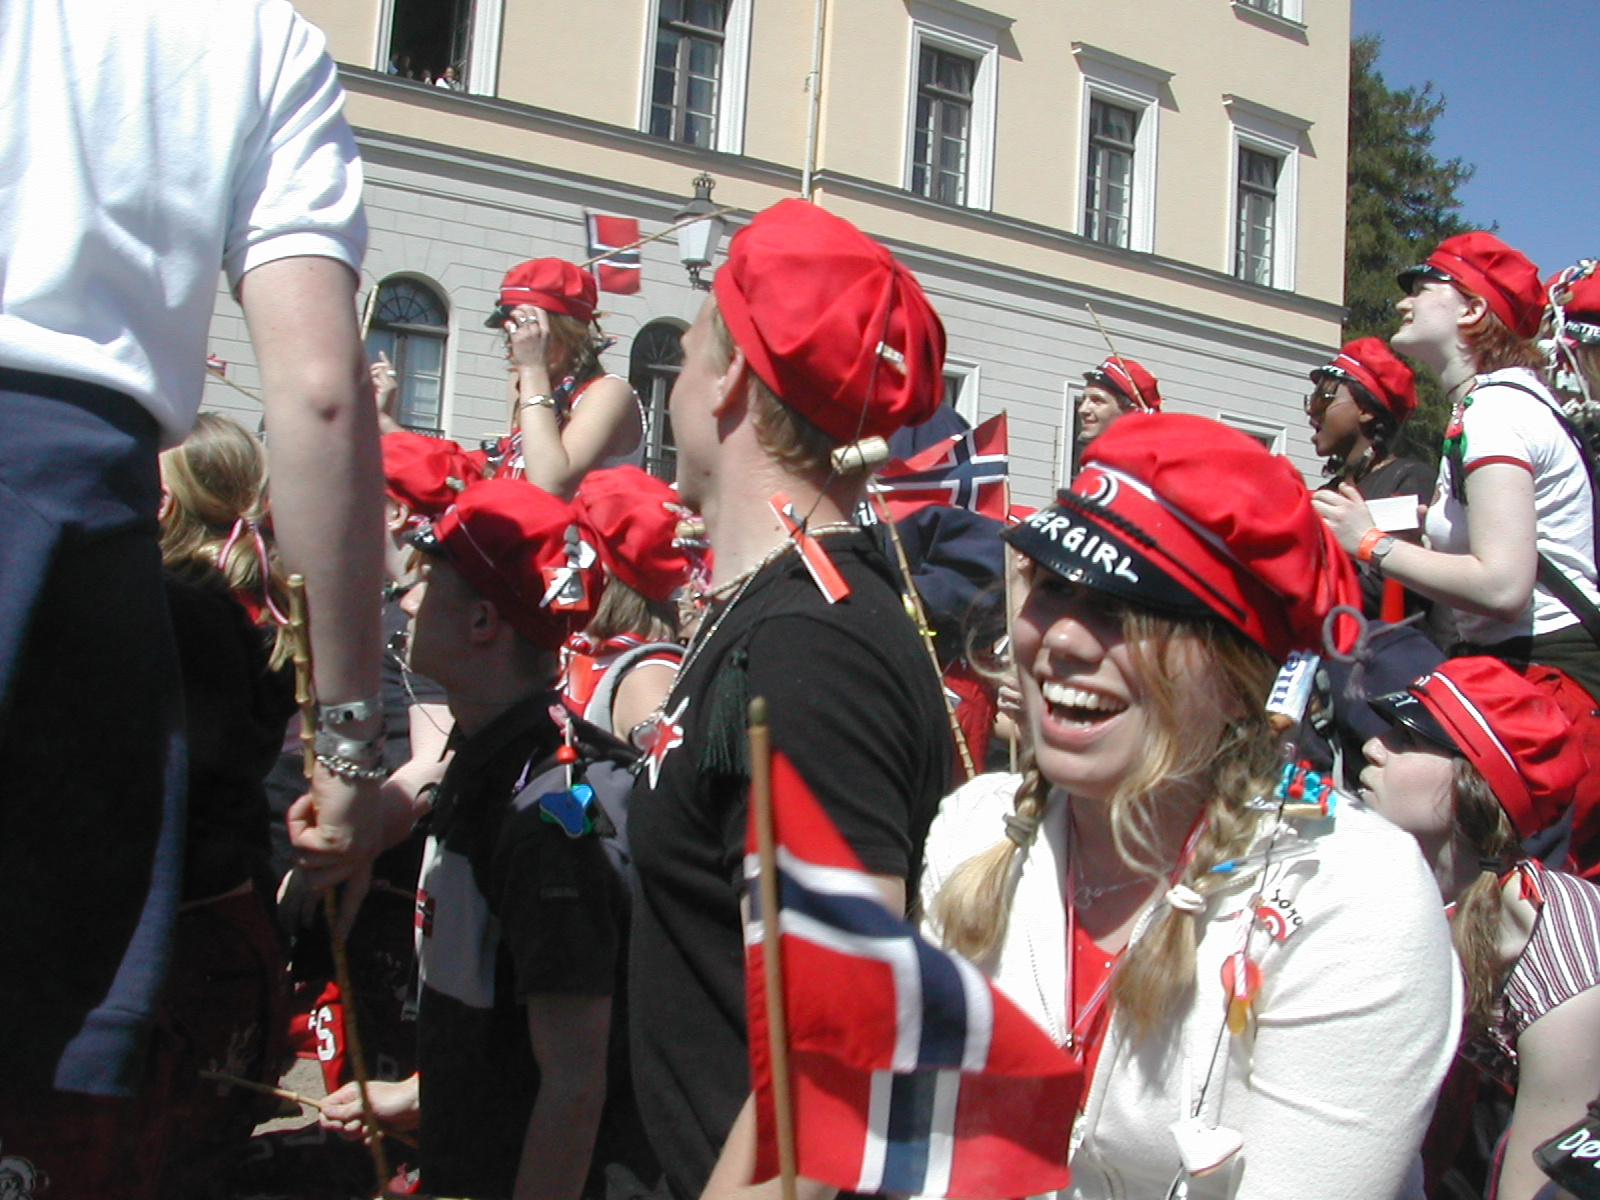 sexleketøy norsk russ naken